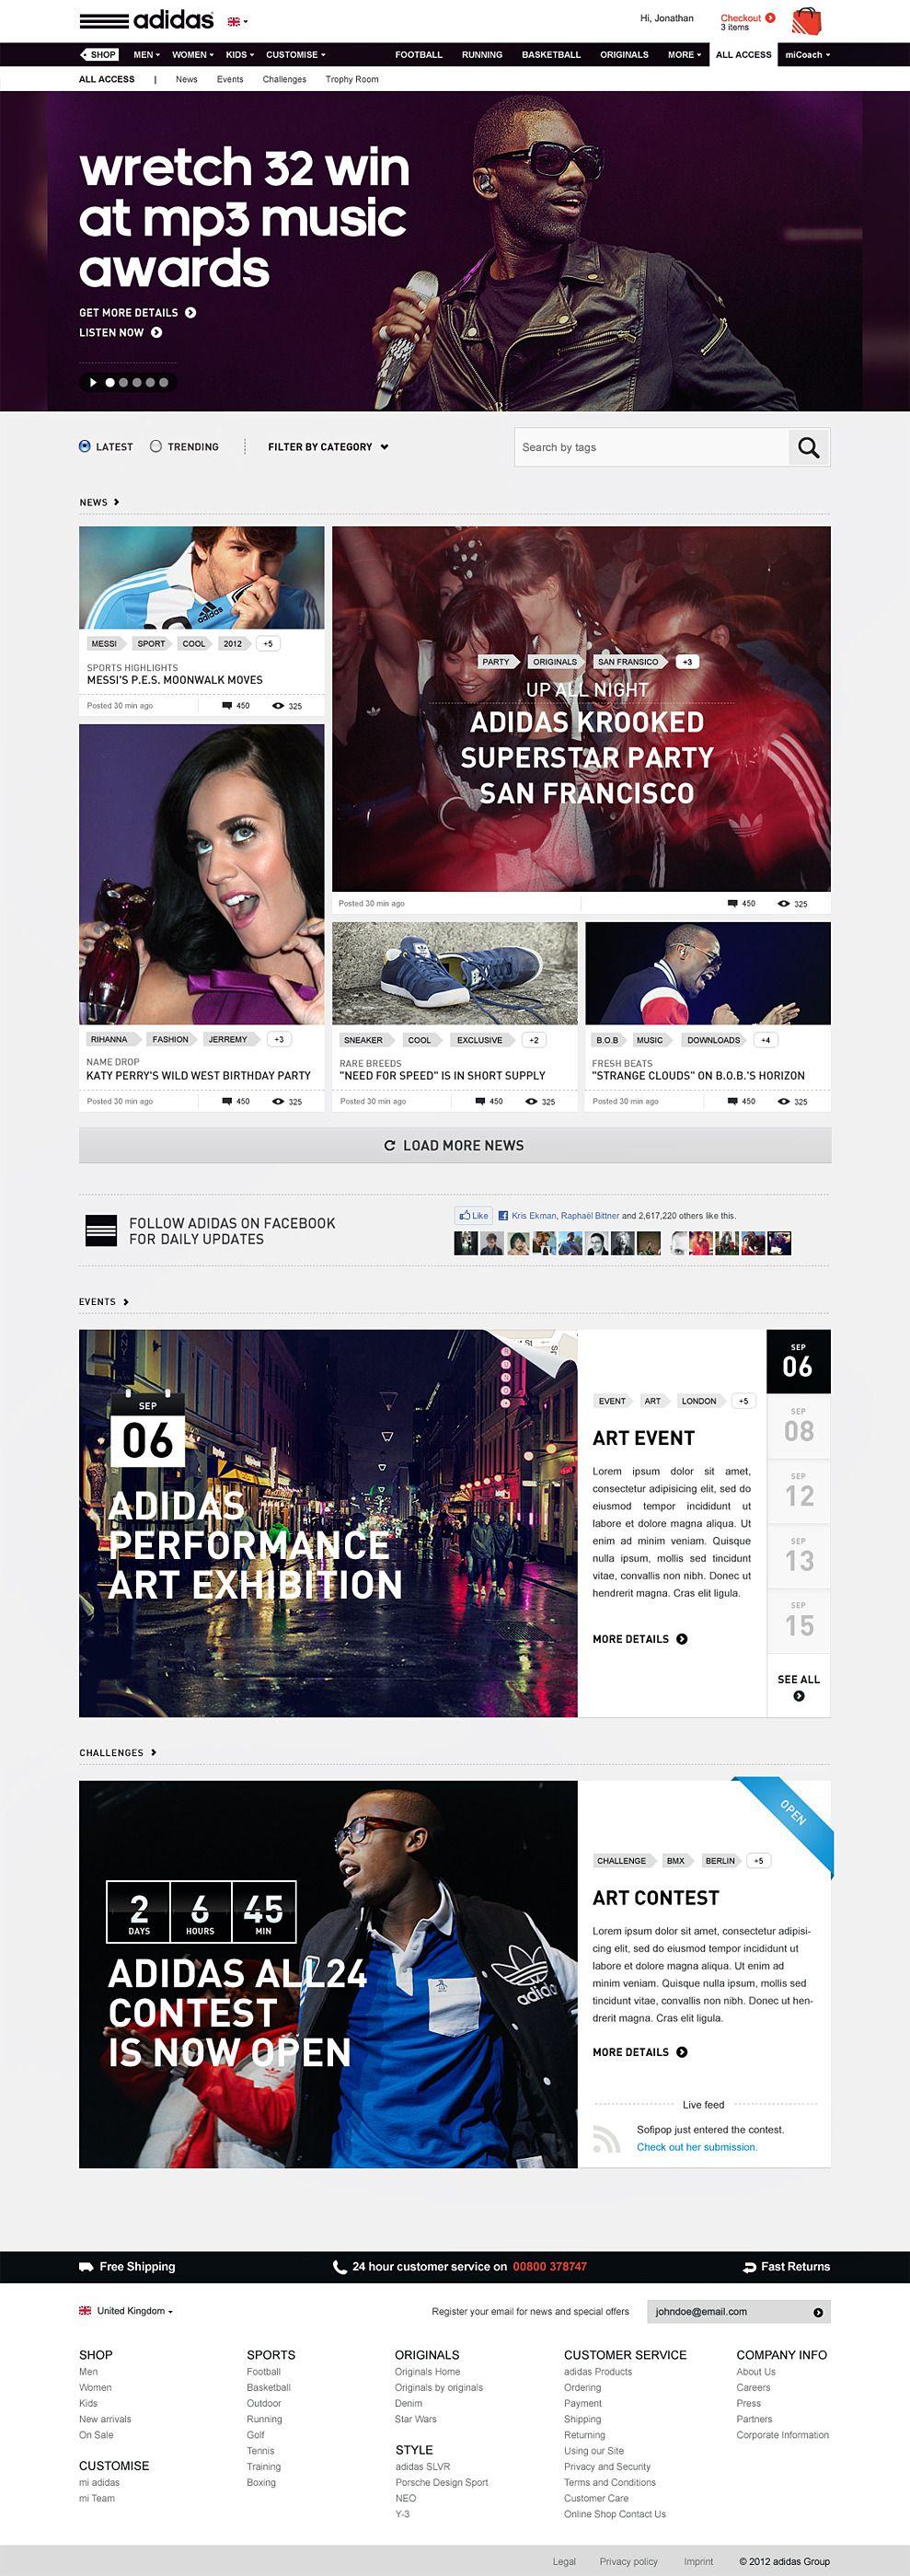 adidas / Go all in - Patrick Dubé / Interactive Art Director #sport #homepage #modular